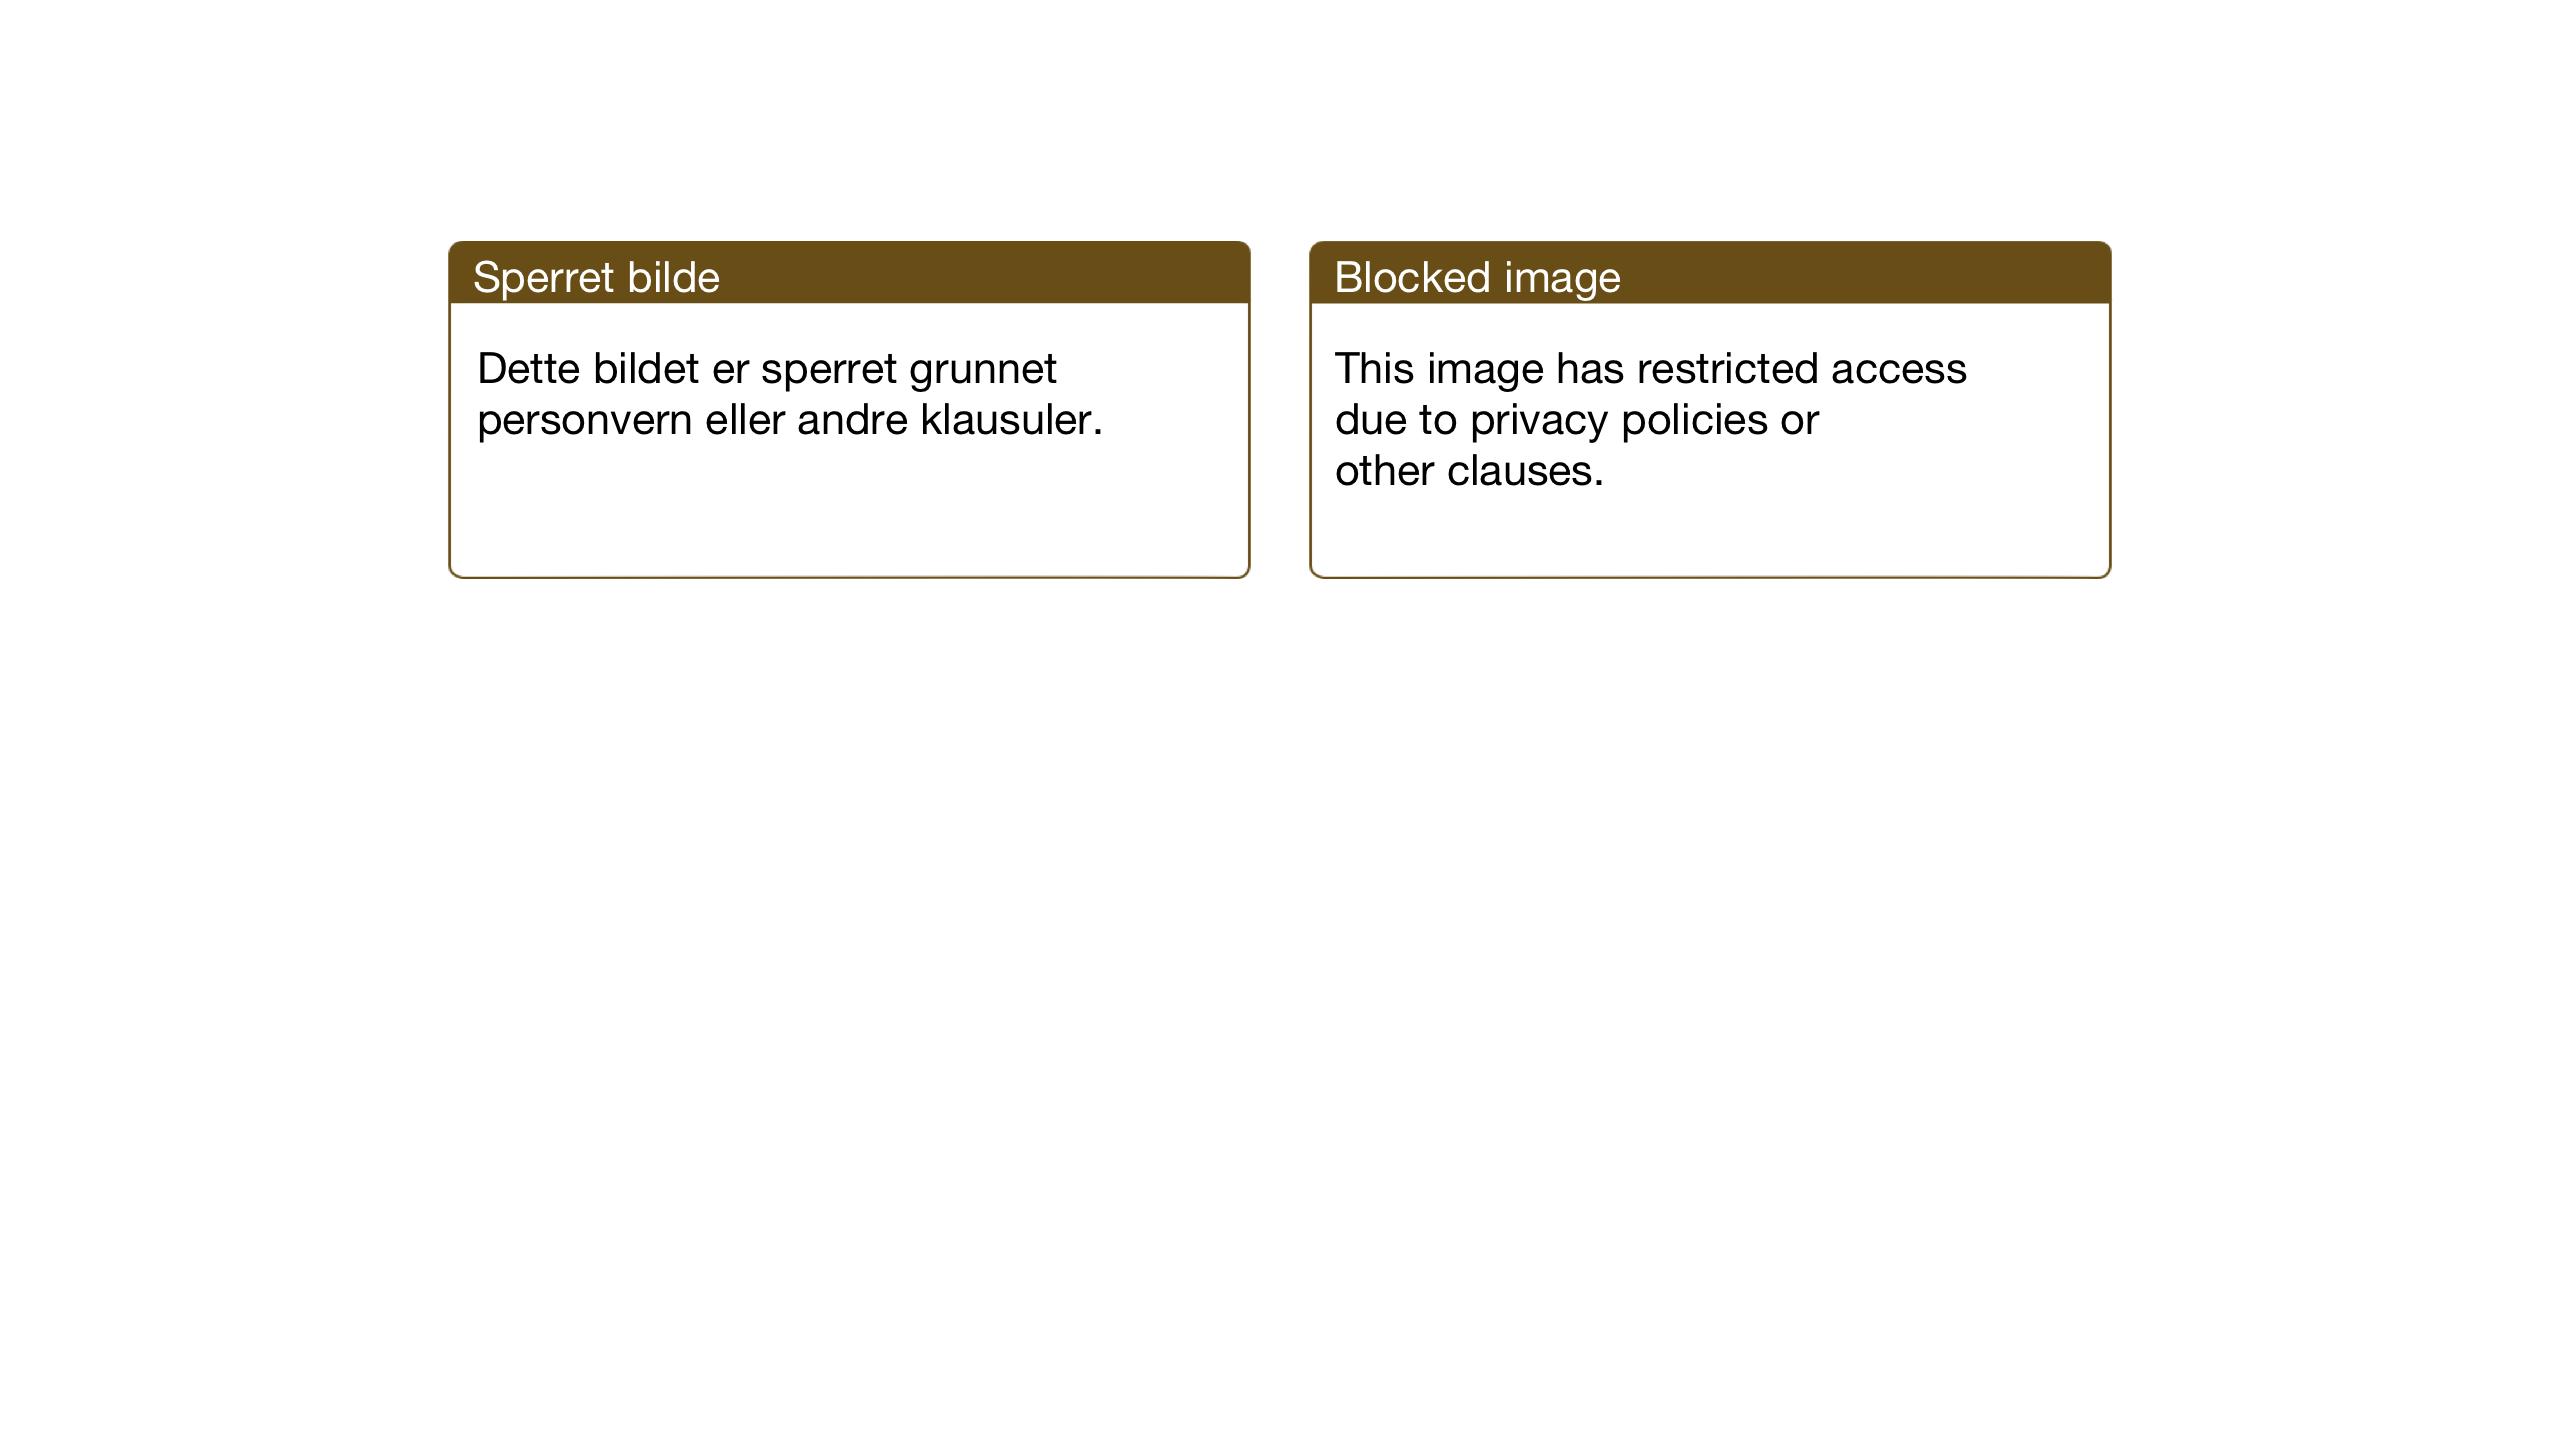 SAB, Domkirken Sokneprestembete, H/Haa: Ministerialbok nr. C 9, 1958-2001, s. 152b-153a